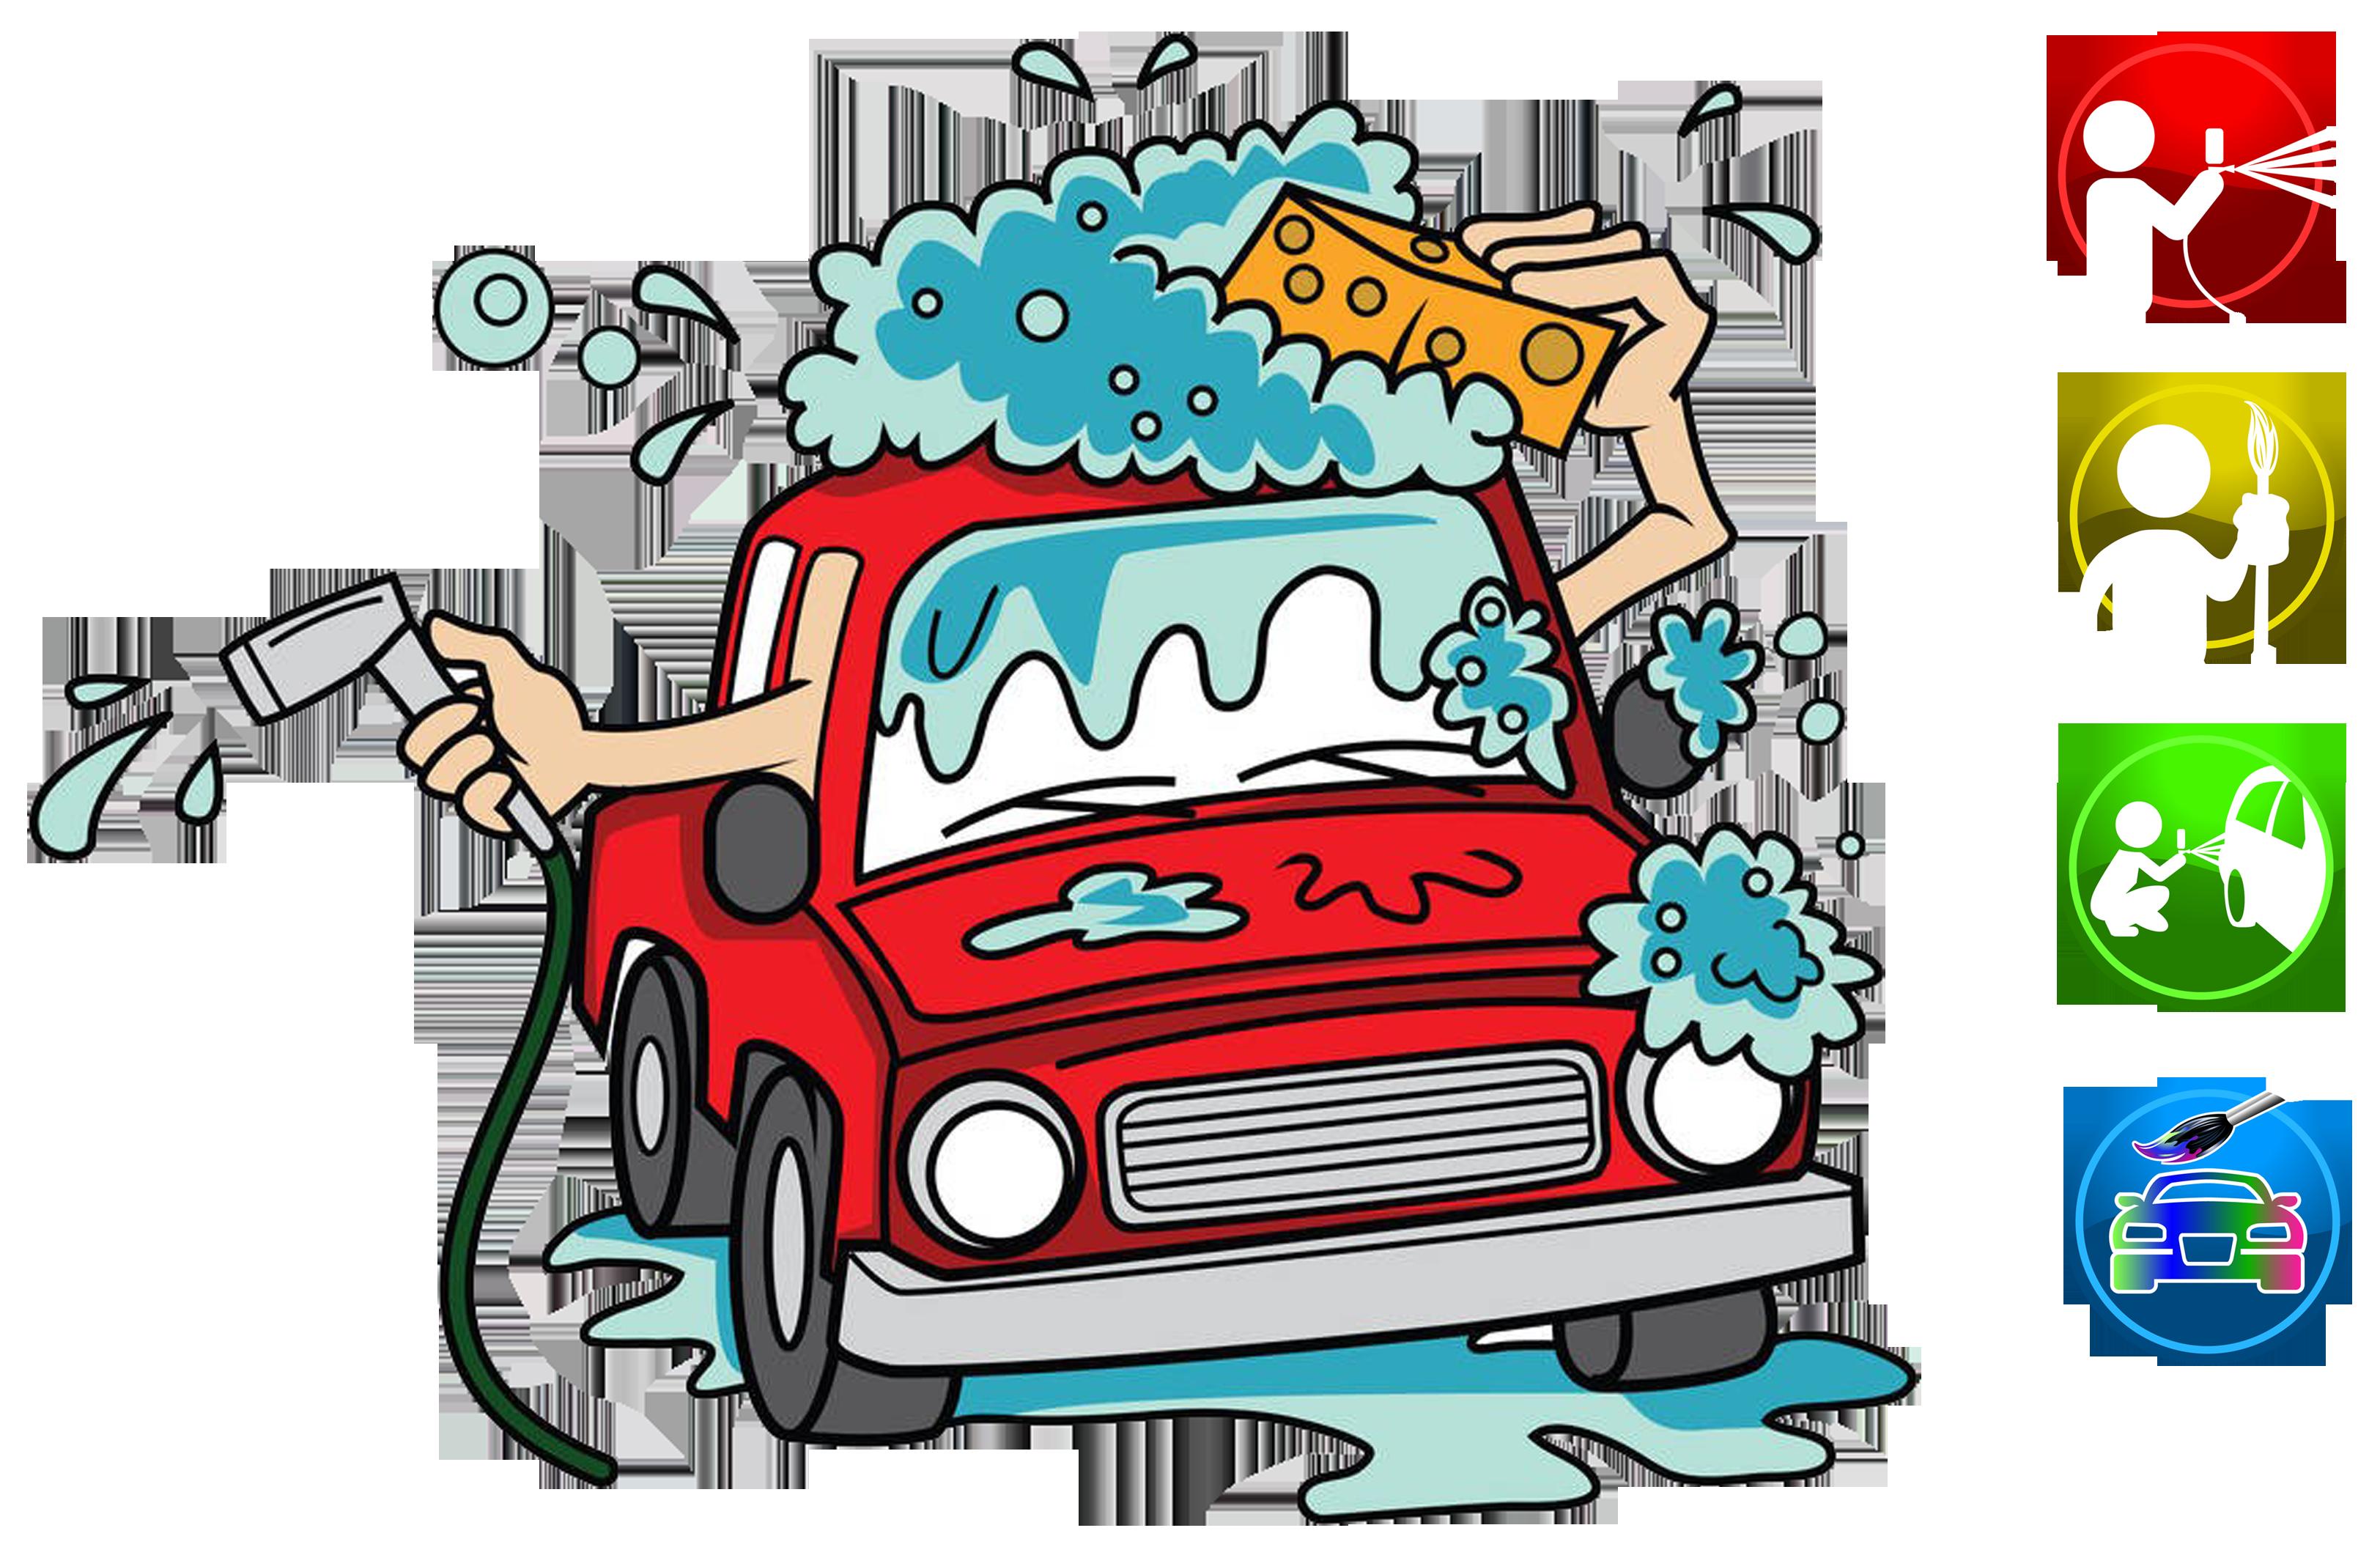 Car wash car clipart banner black and white Car wash Cartoon Clip art - Cartoon car wash advertisement 3248*2126 ... banner black and white